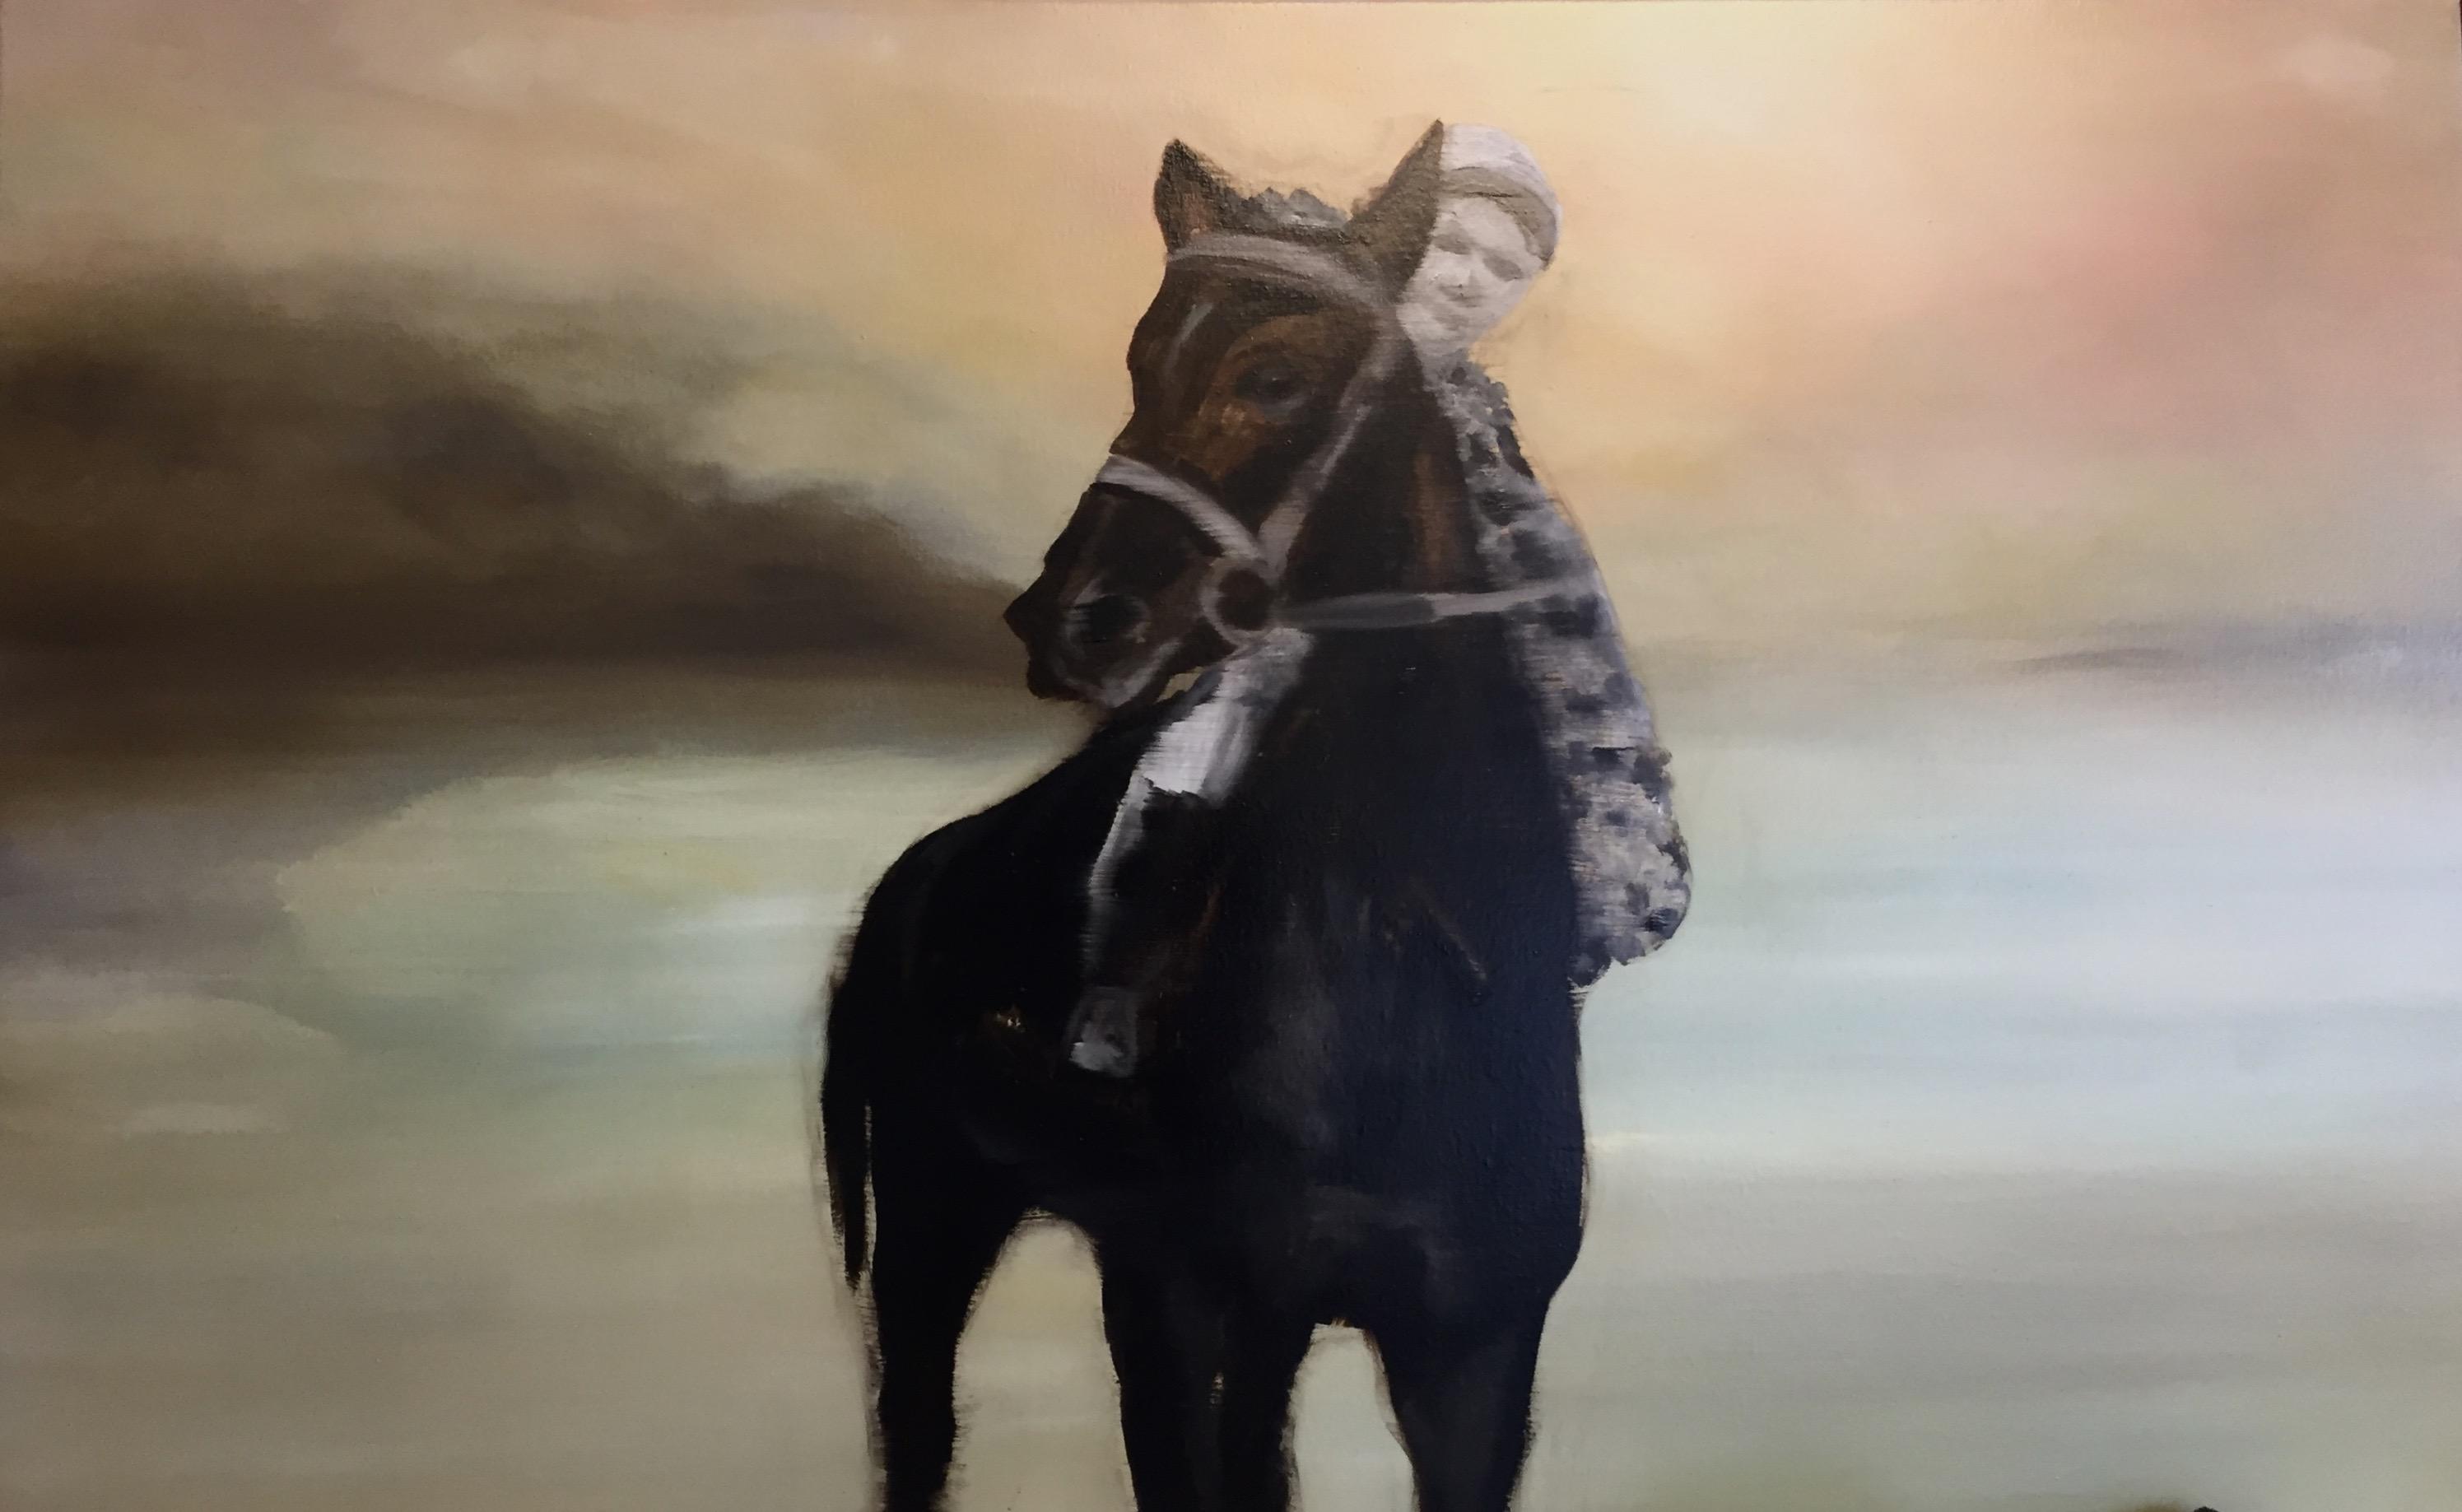 Primer premio.Soledad. (2016) - Daniel Berdala